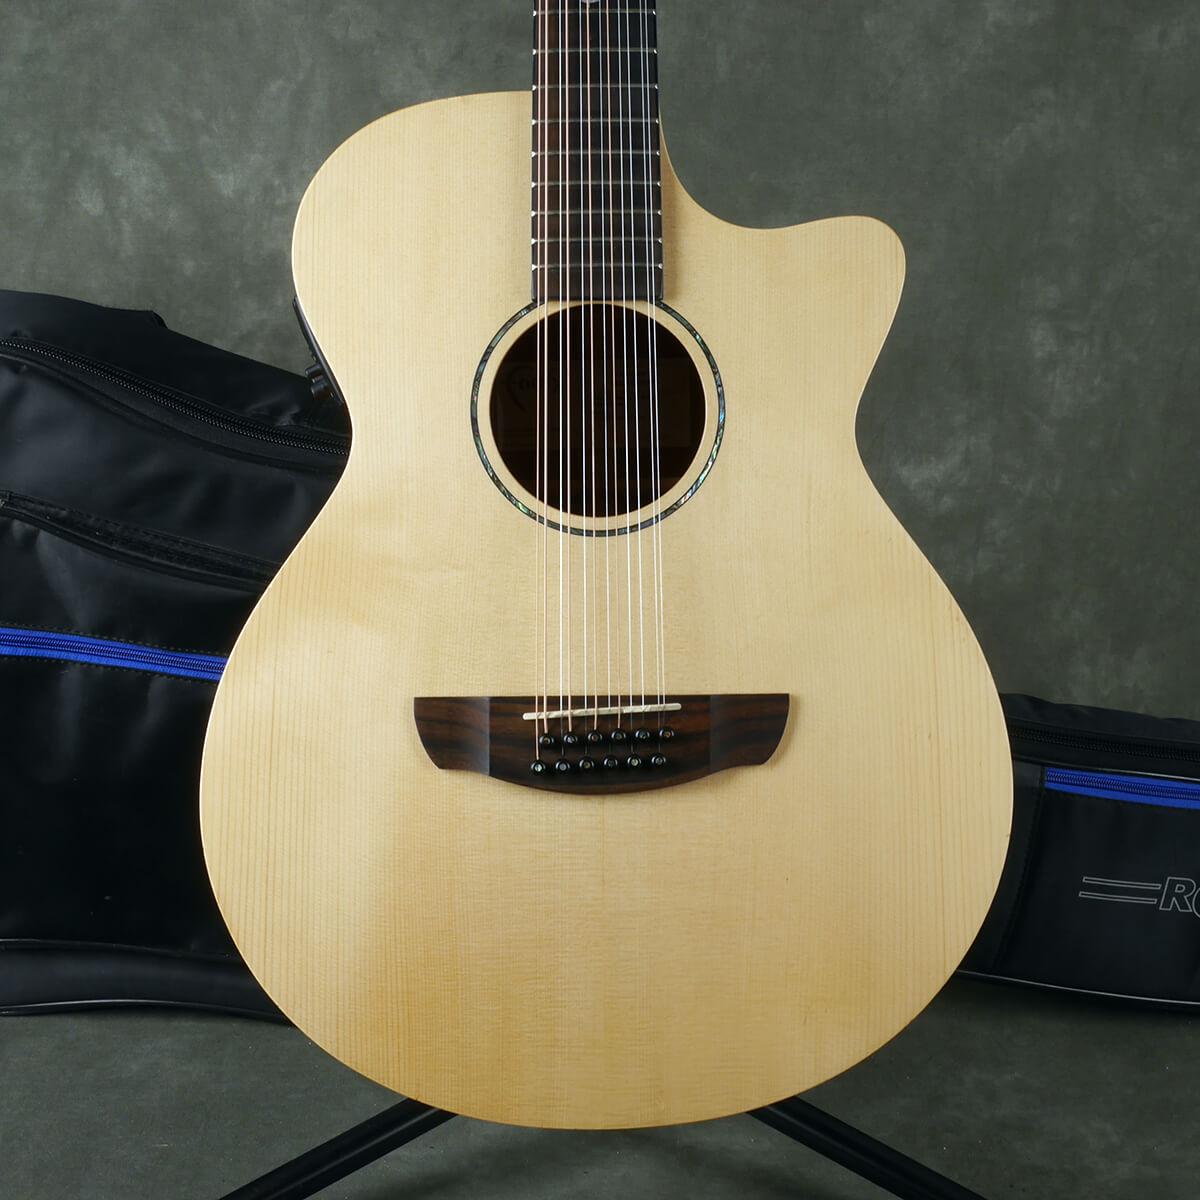 Faith Naked Venus FKV 12-String Electro-Acoustic - Natural w/Gig Bag - 2nd Hand